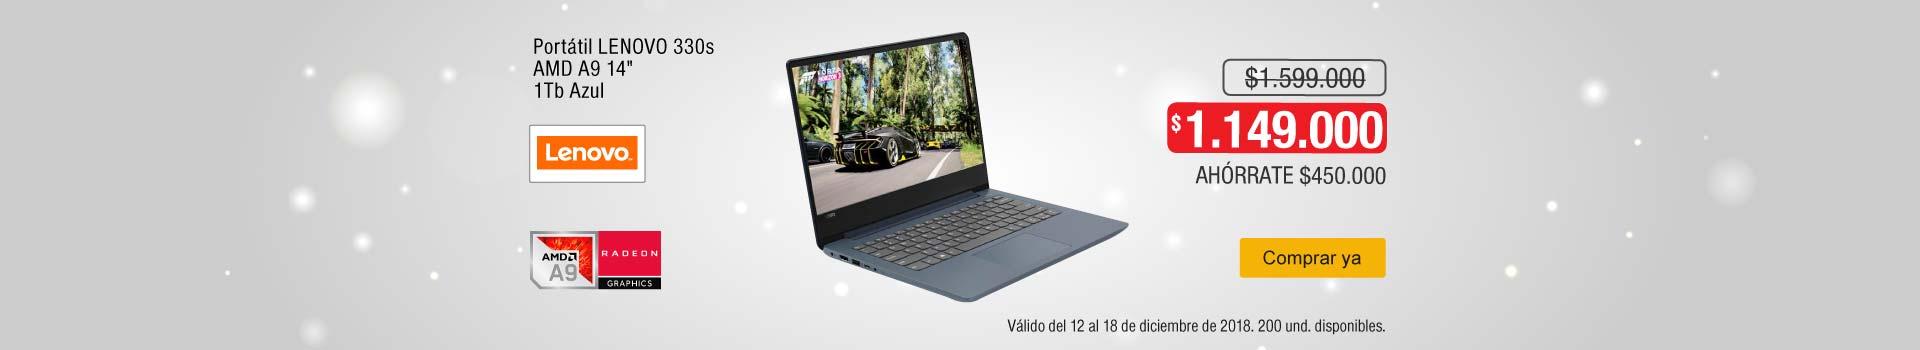 AK-KT-BCAT-2-computadores y tablets-PP---Lenovo-Portátil 330s A9-dic15